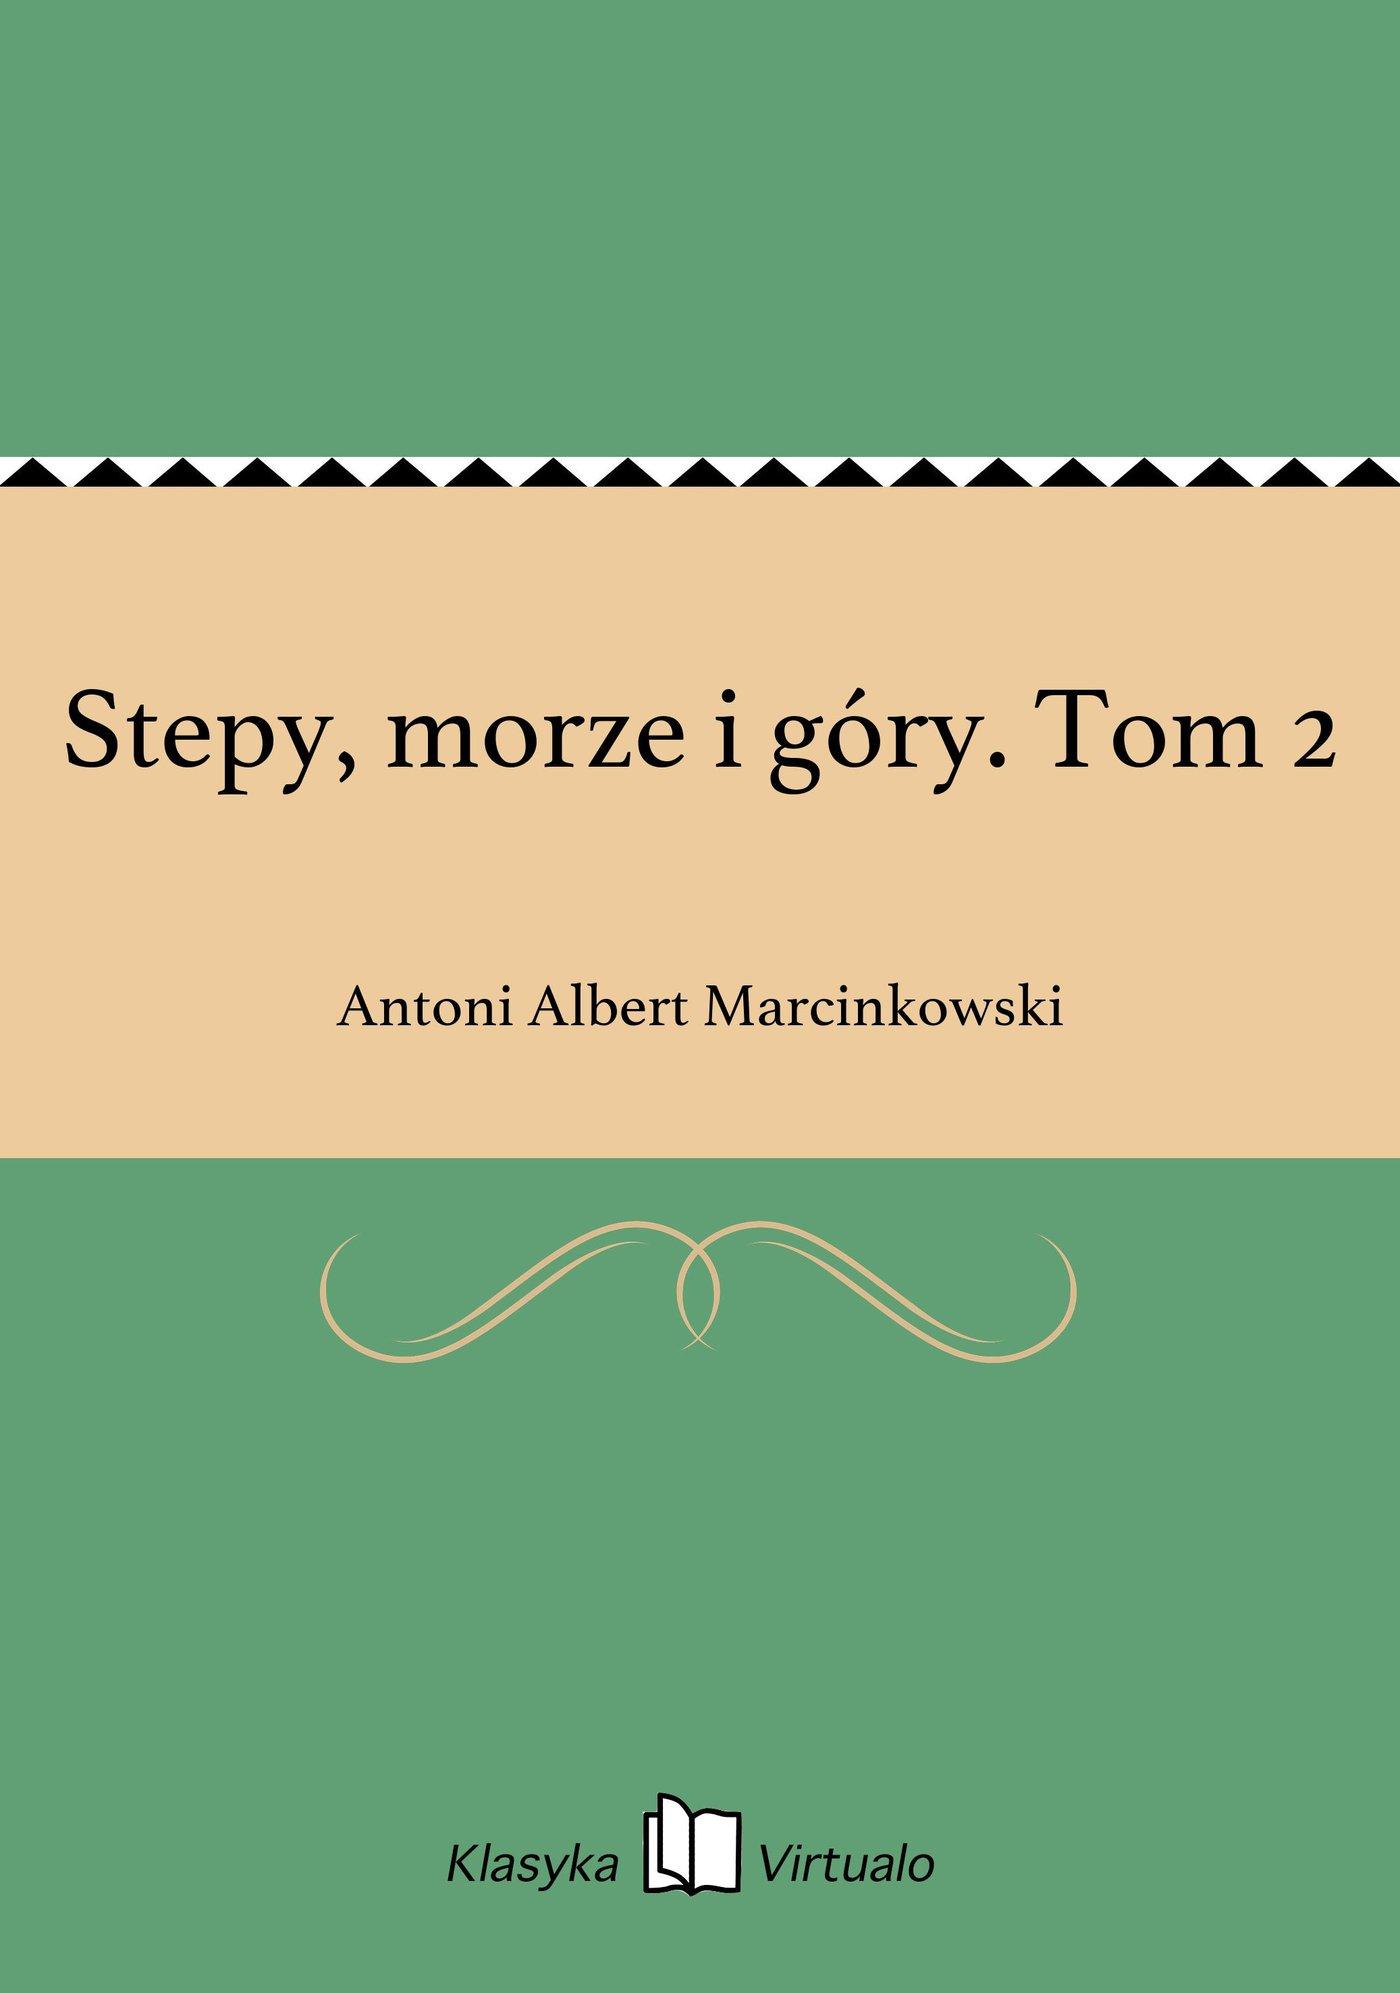 Stepy, morze i góry. Tom 2 - Ebook (Książka EPUB) do pobrania w formacie EPUB